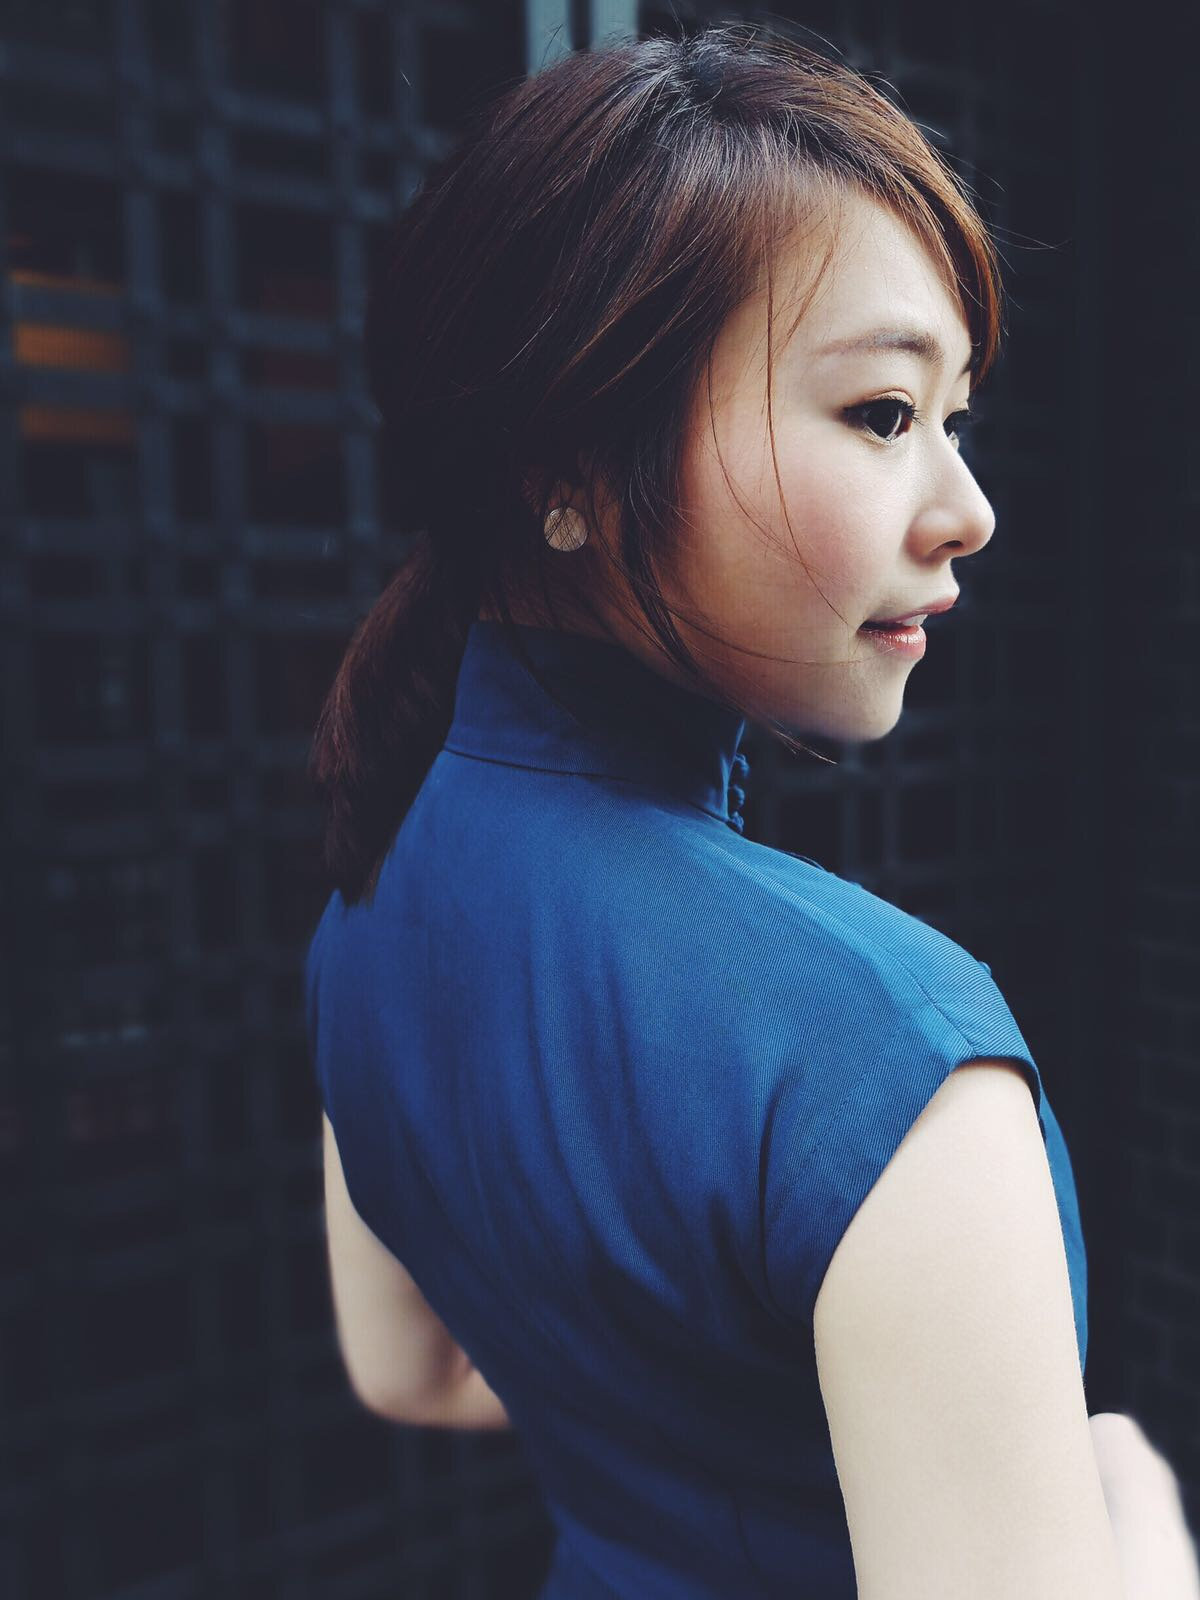 女裝旗袍租借 Qipao Rental